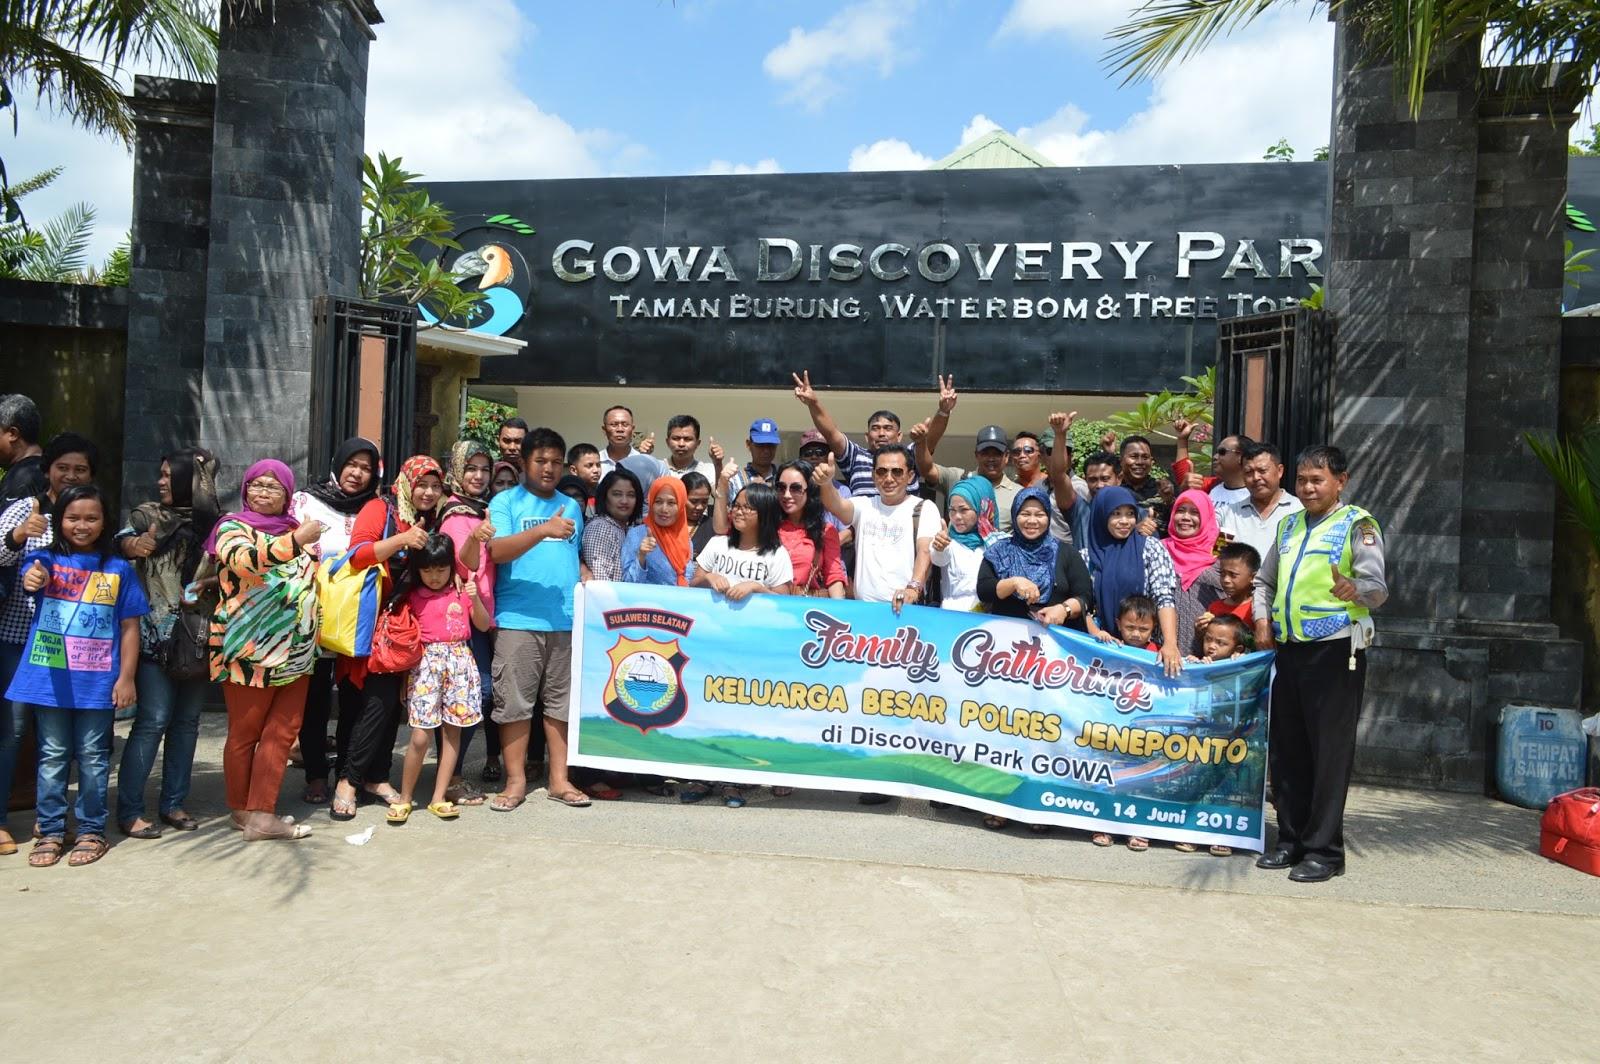 Satlantas Polres Jeneponto Wisata Makassar Gowa Discovery Park Baharudin Sh